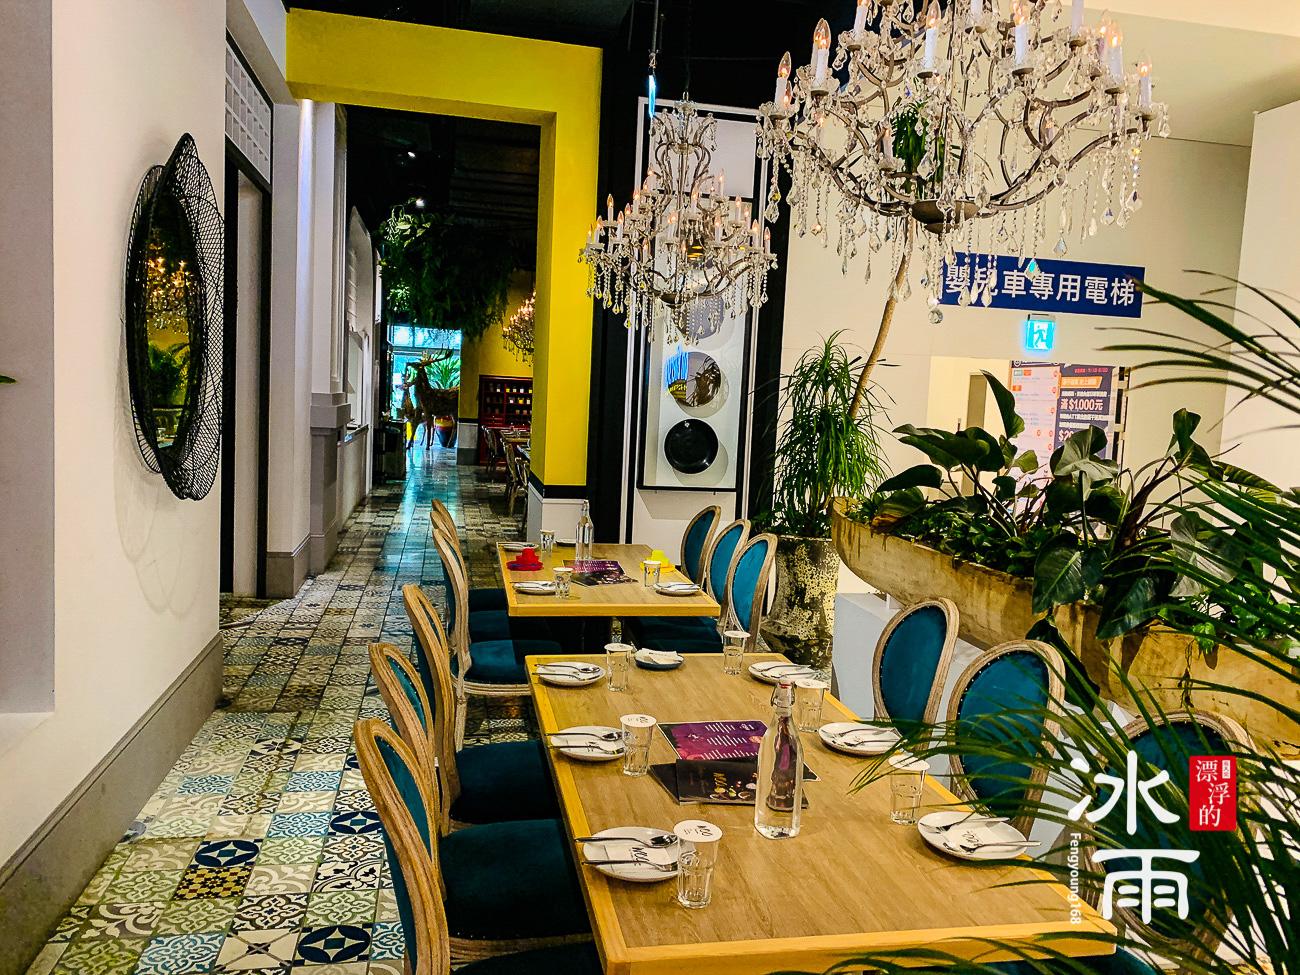 WOOTAIWAN大直ATT店|混搭風格的室內空間